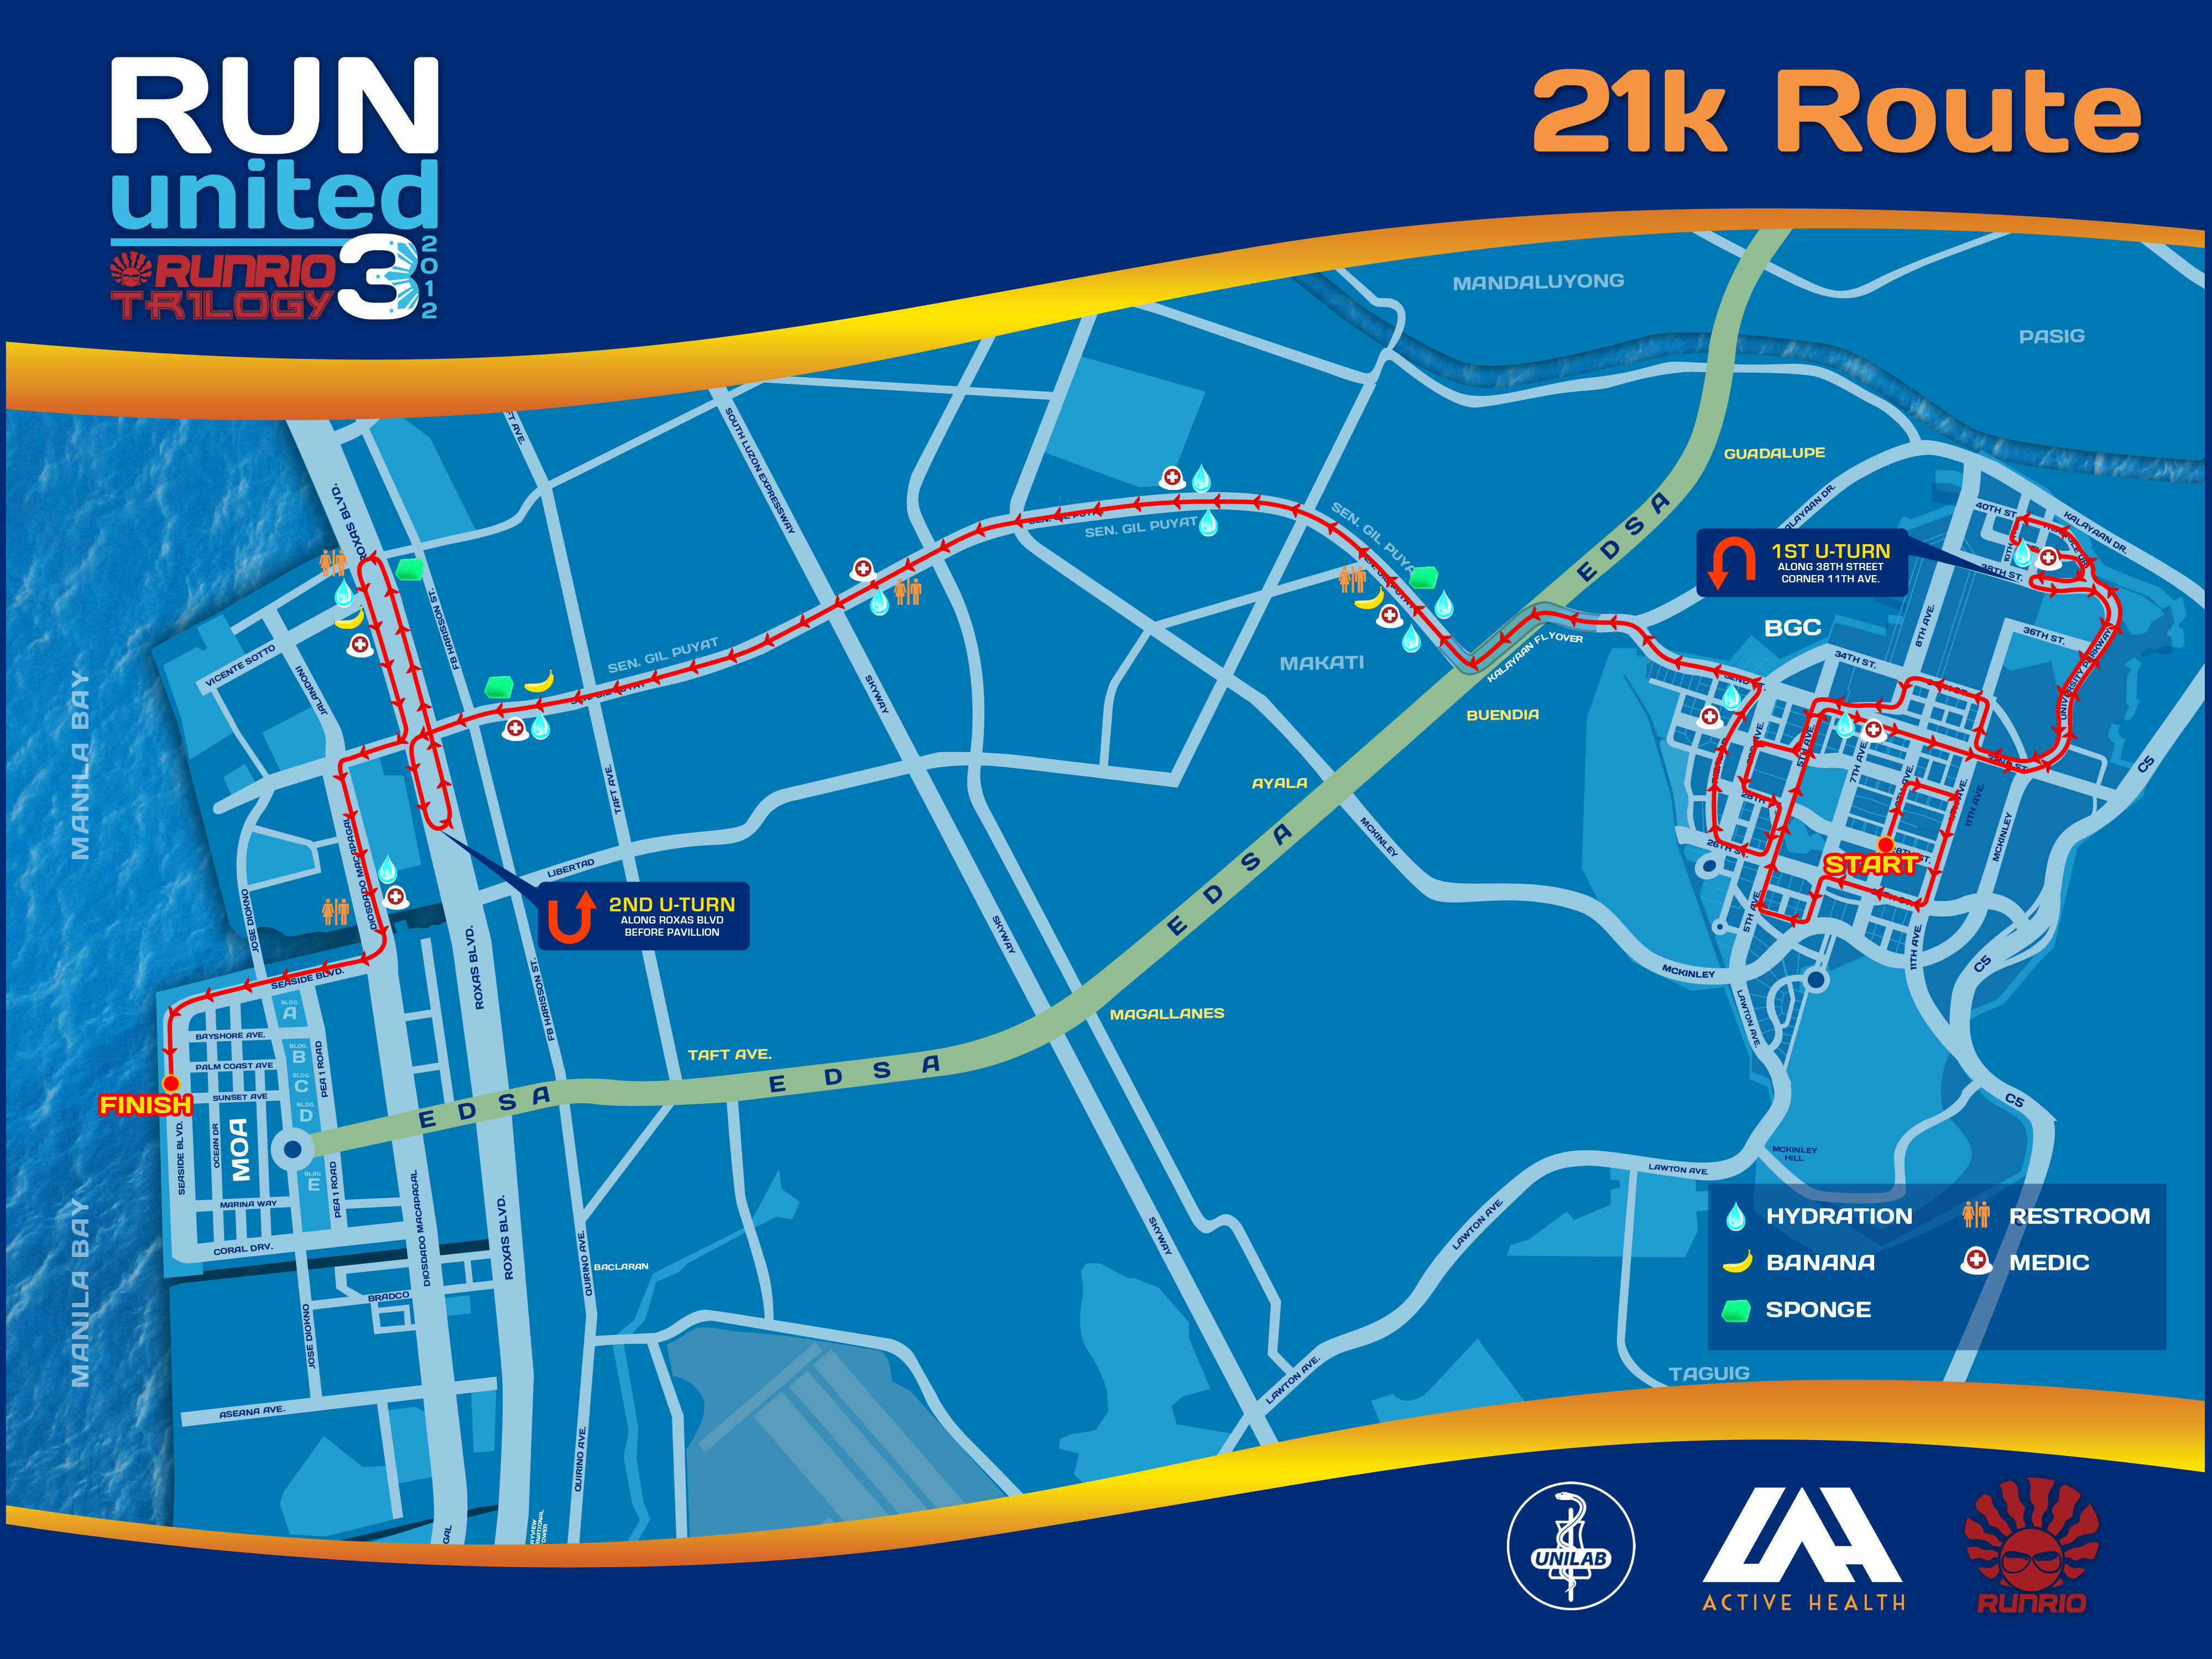 runrio trilogy 3 unilab run united 3 route maps | kulit on the run